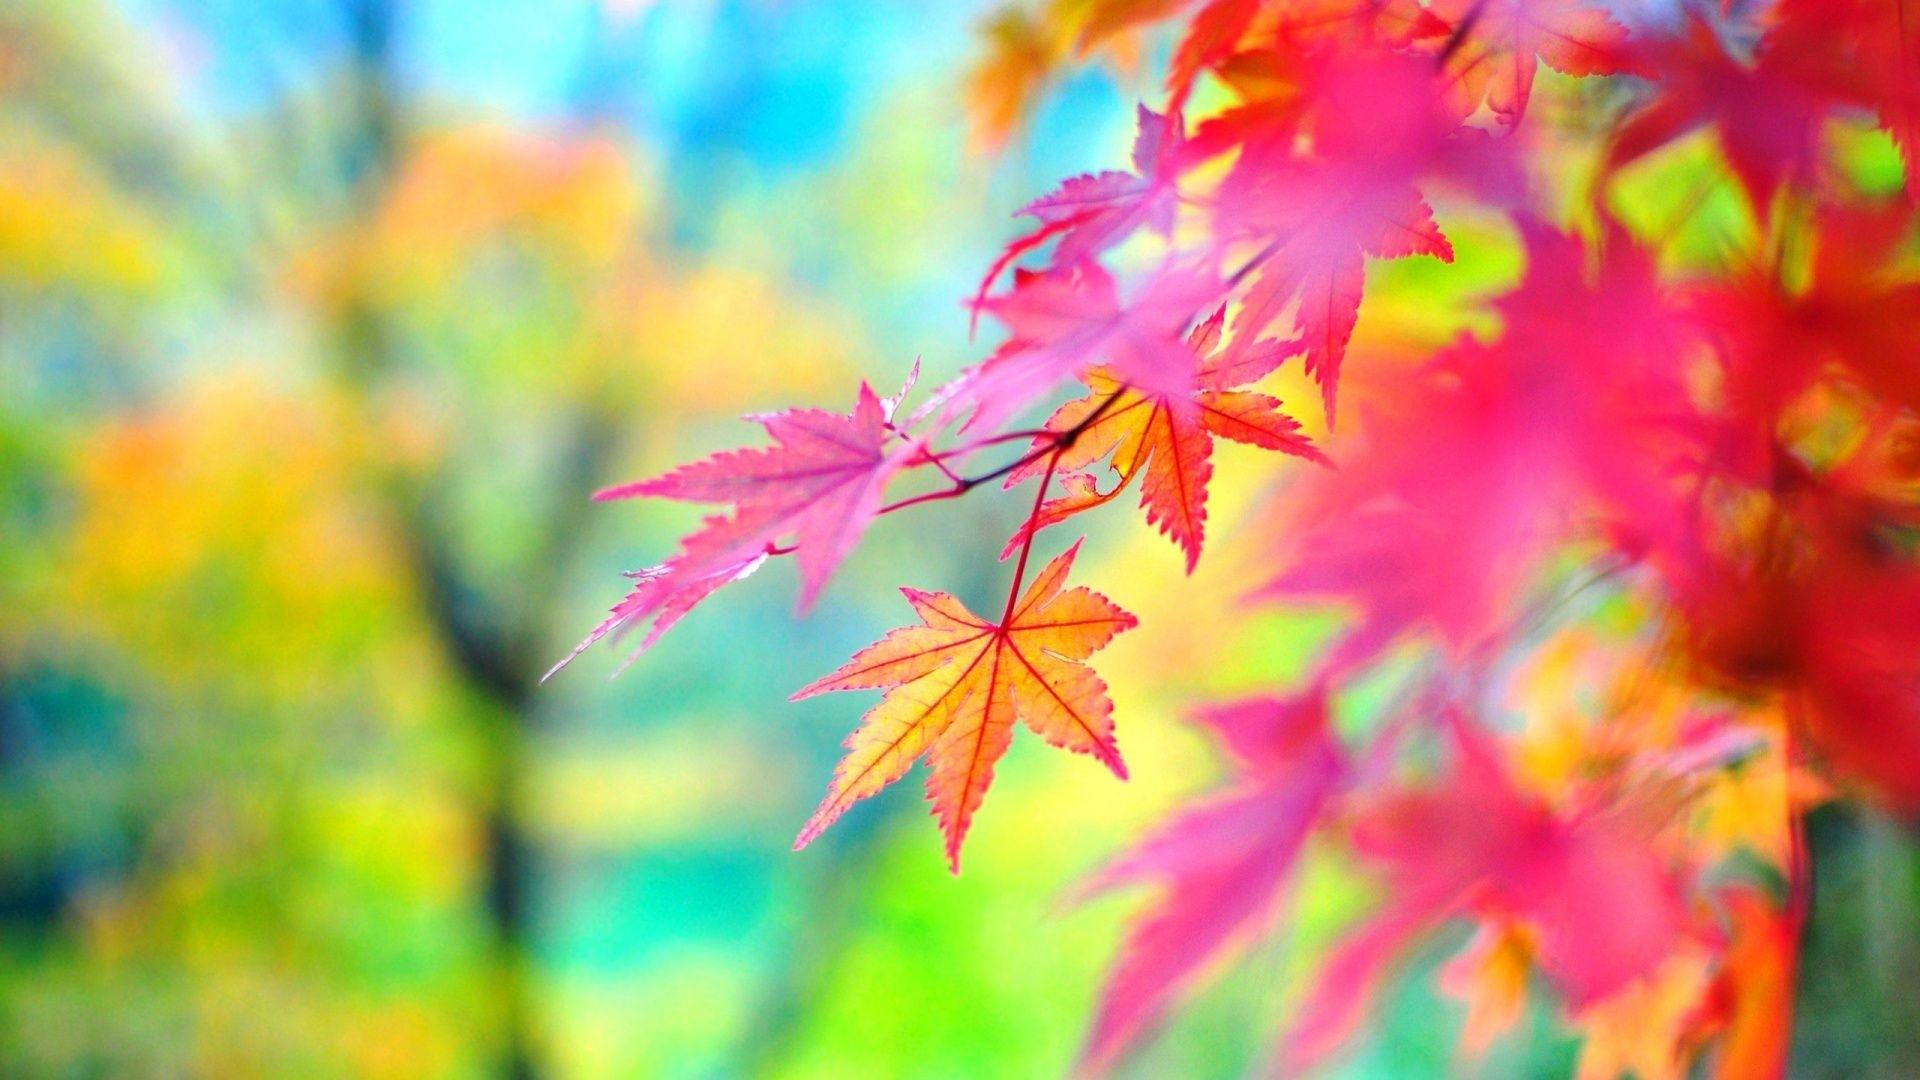 colorful nature wallpaper | epic car wallpapers | pinterest | nature